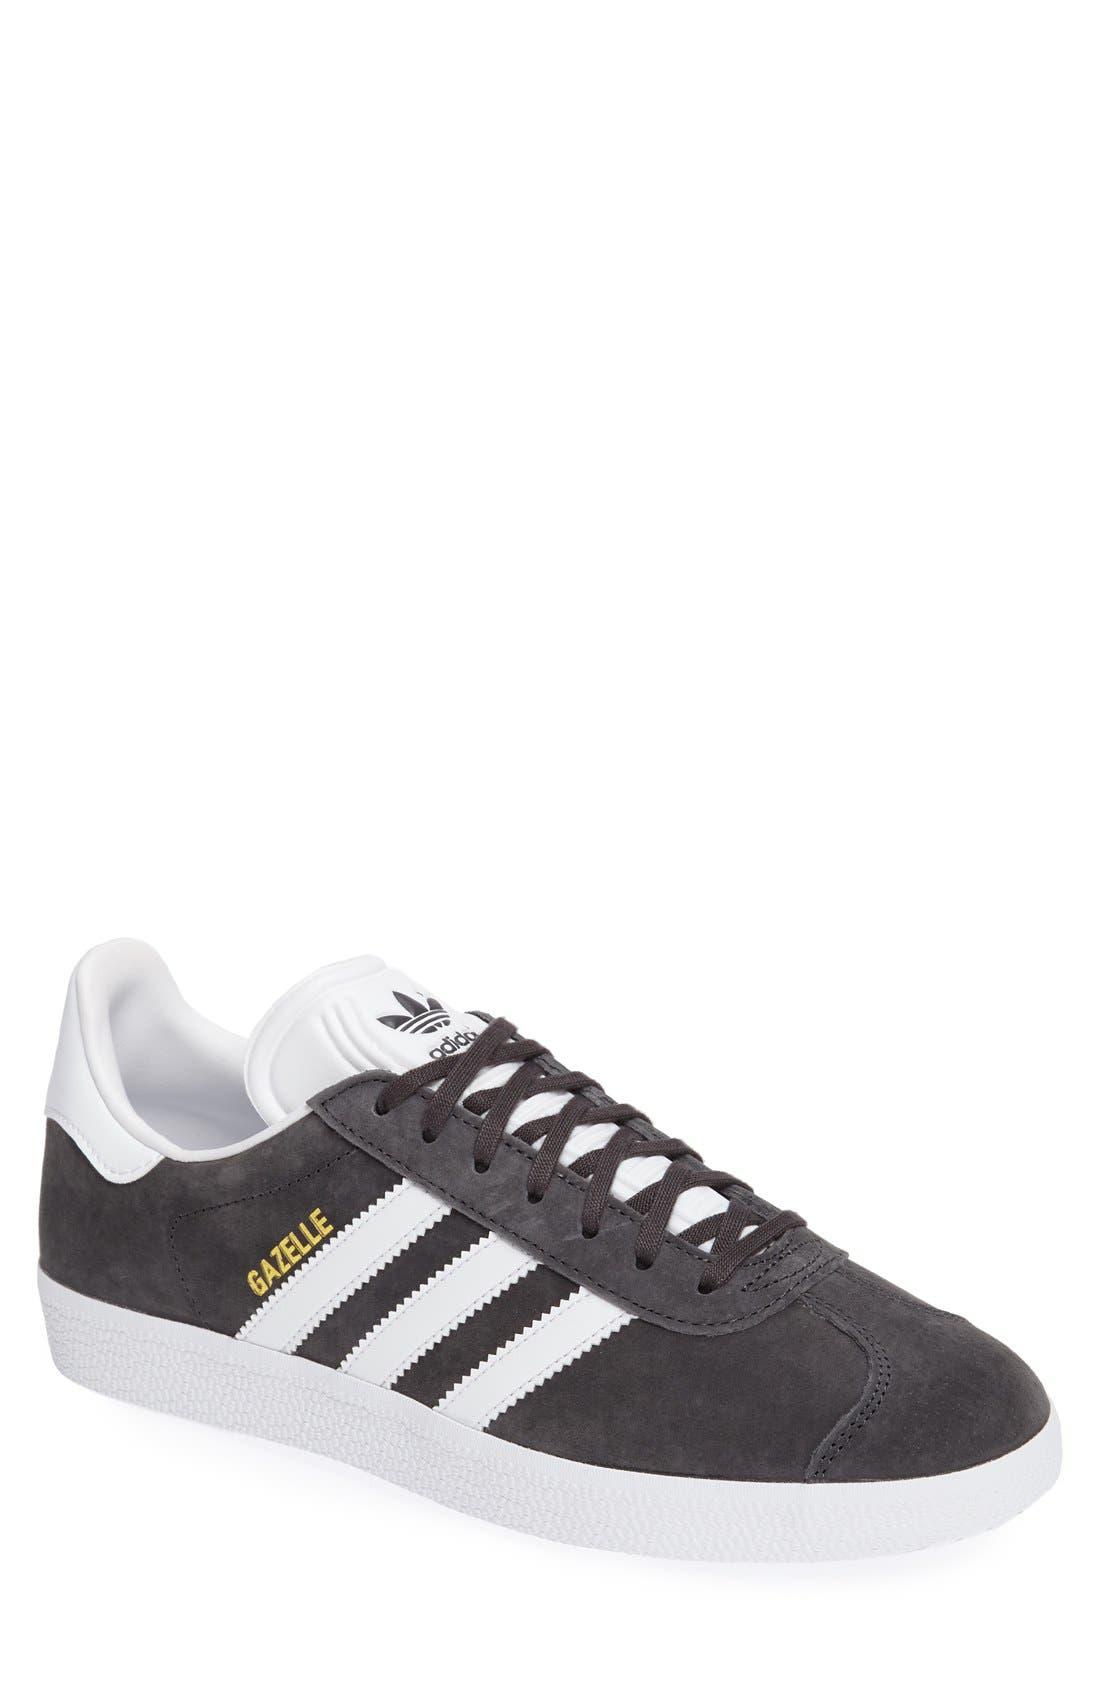 ADIDAS Gazelle Sneaker, Main, color, 020